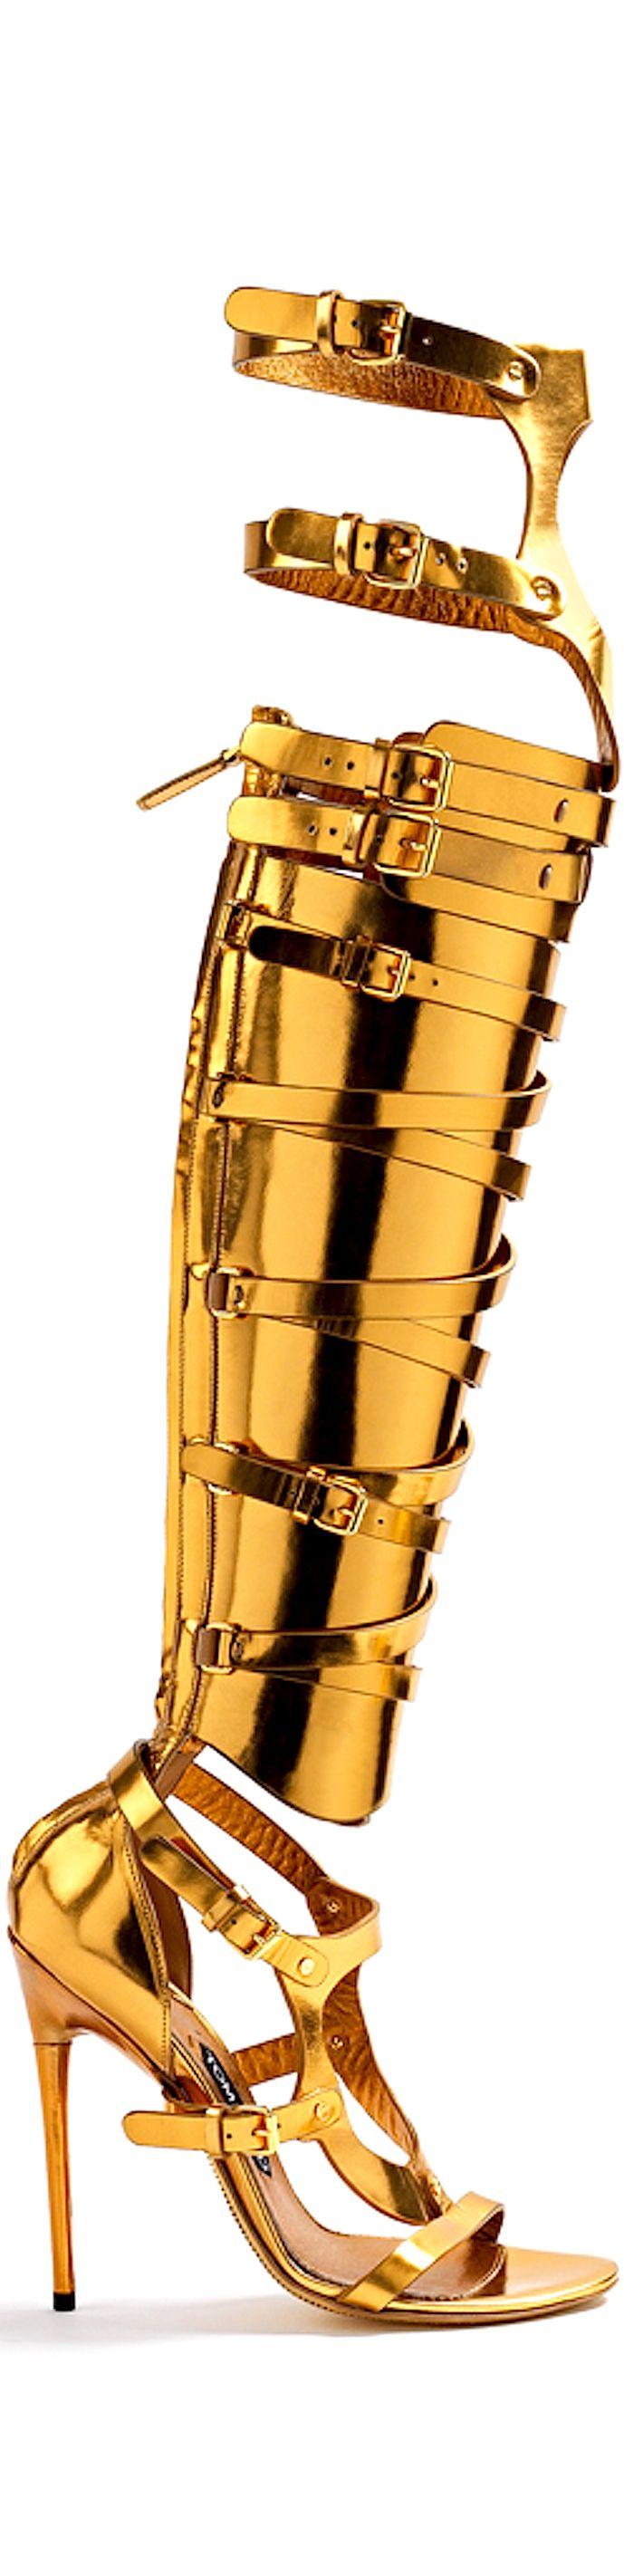 TOM FORD - Metallic gold gladiator boot